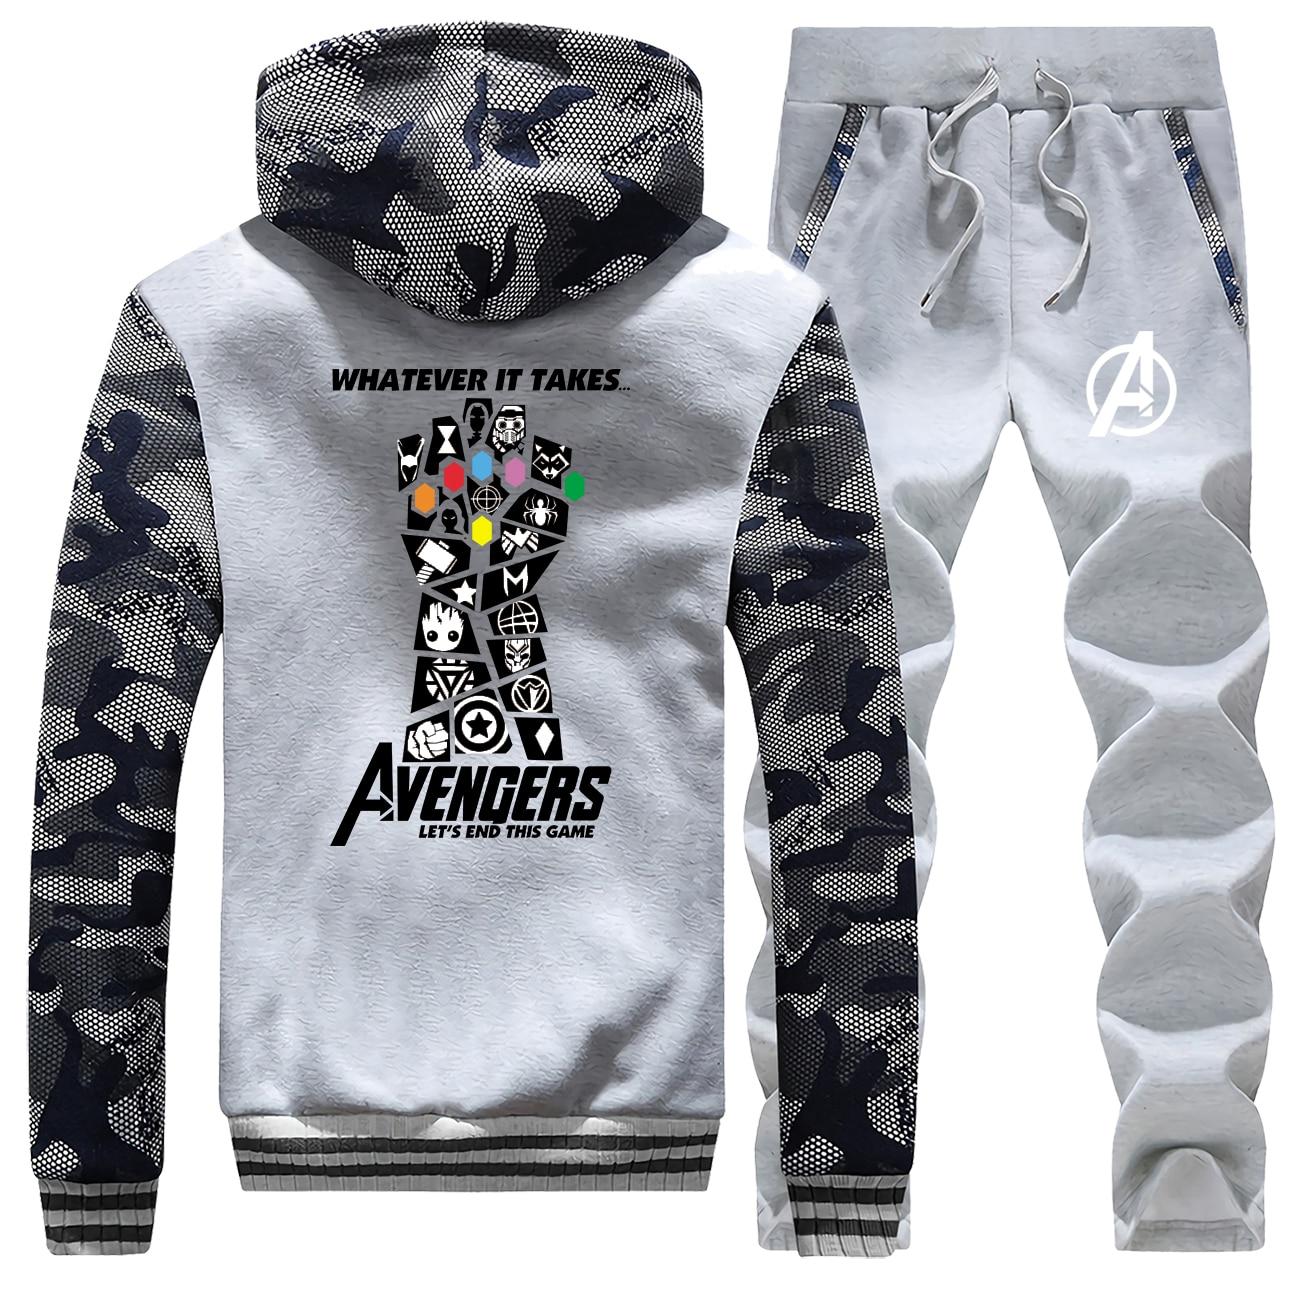 Avengers Jackets Set End Game Hoodies Whatever It Takes Men's Camouflage Sets Infinity Gauntlet Fleece Fashion Sportsman Wear